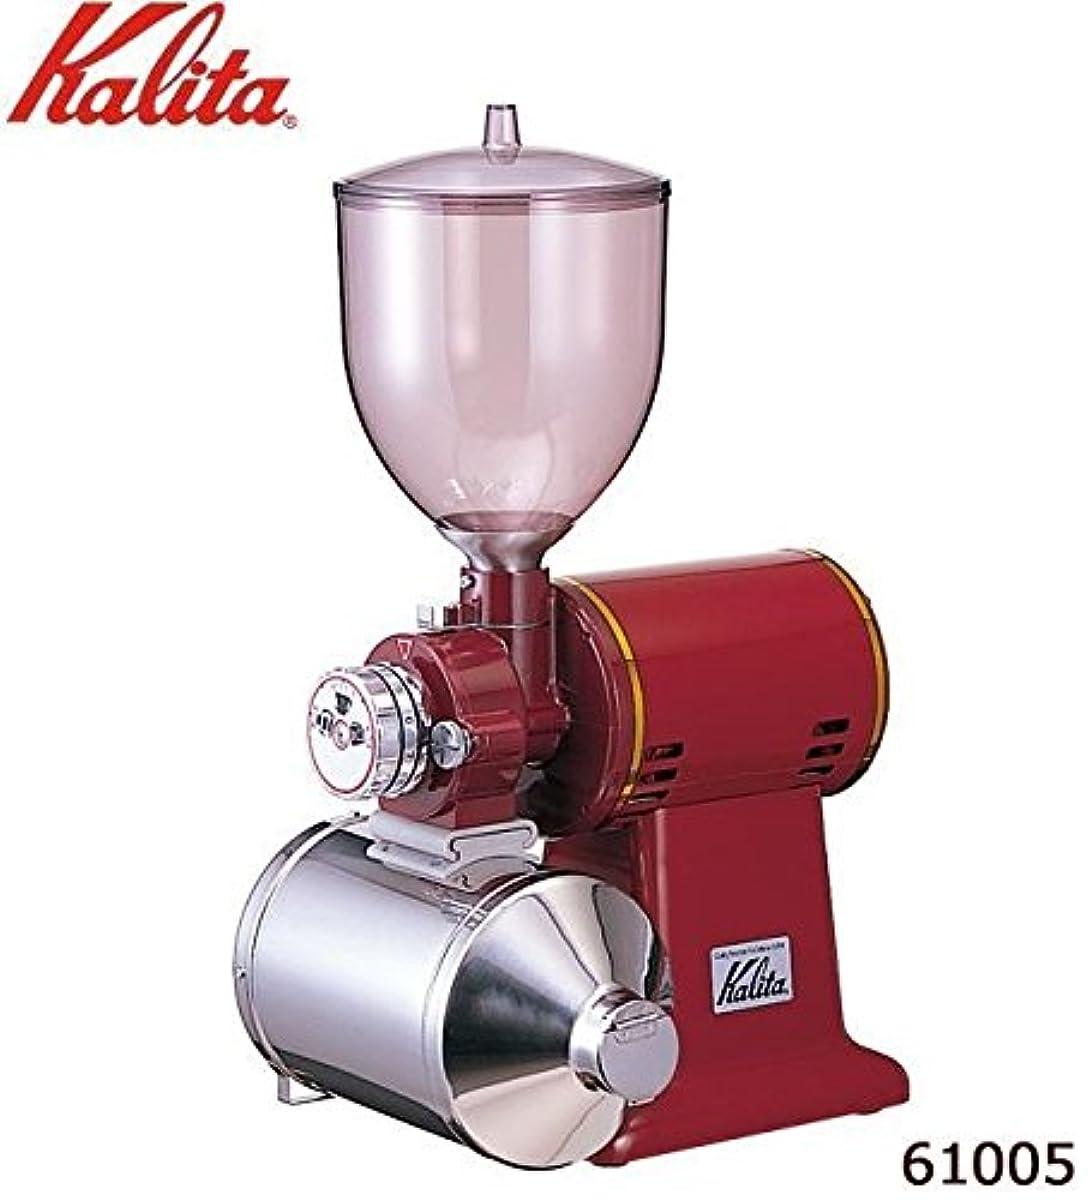 Kalita(칼리타) 업무용 전동 커피 밀 하이 컷 밀 61005-